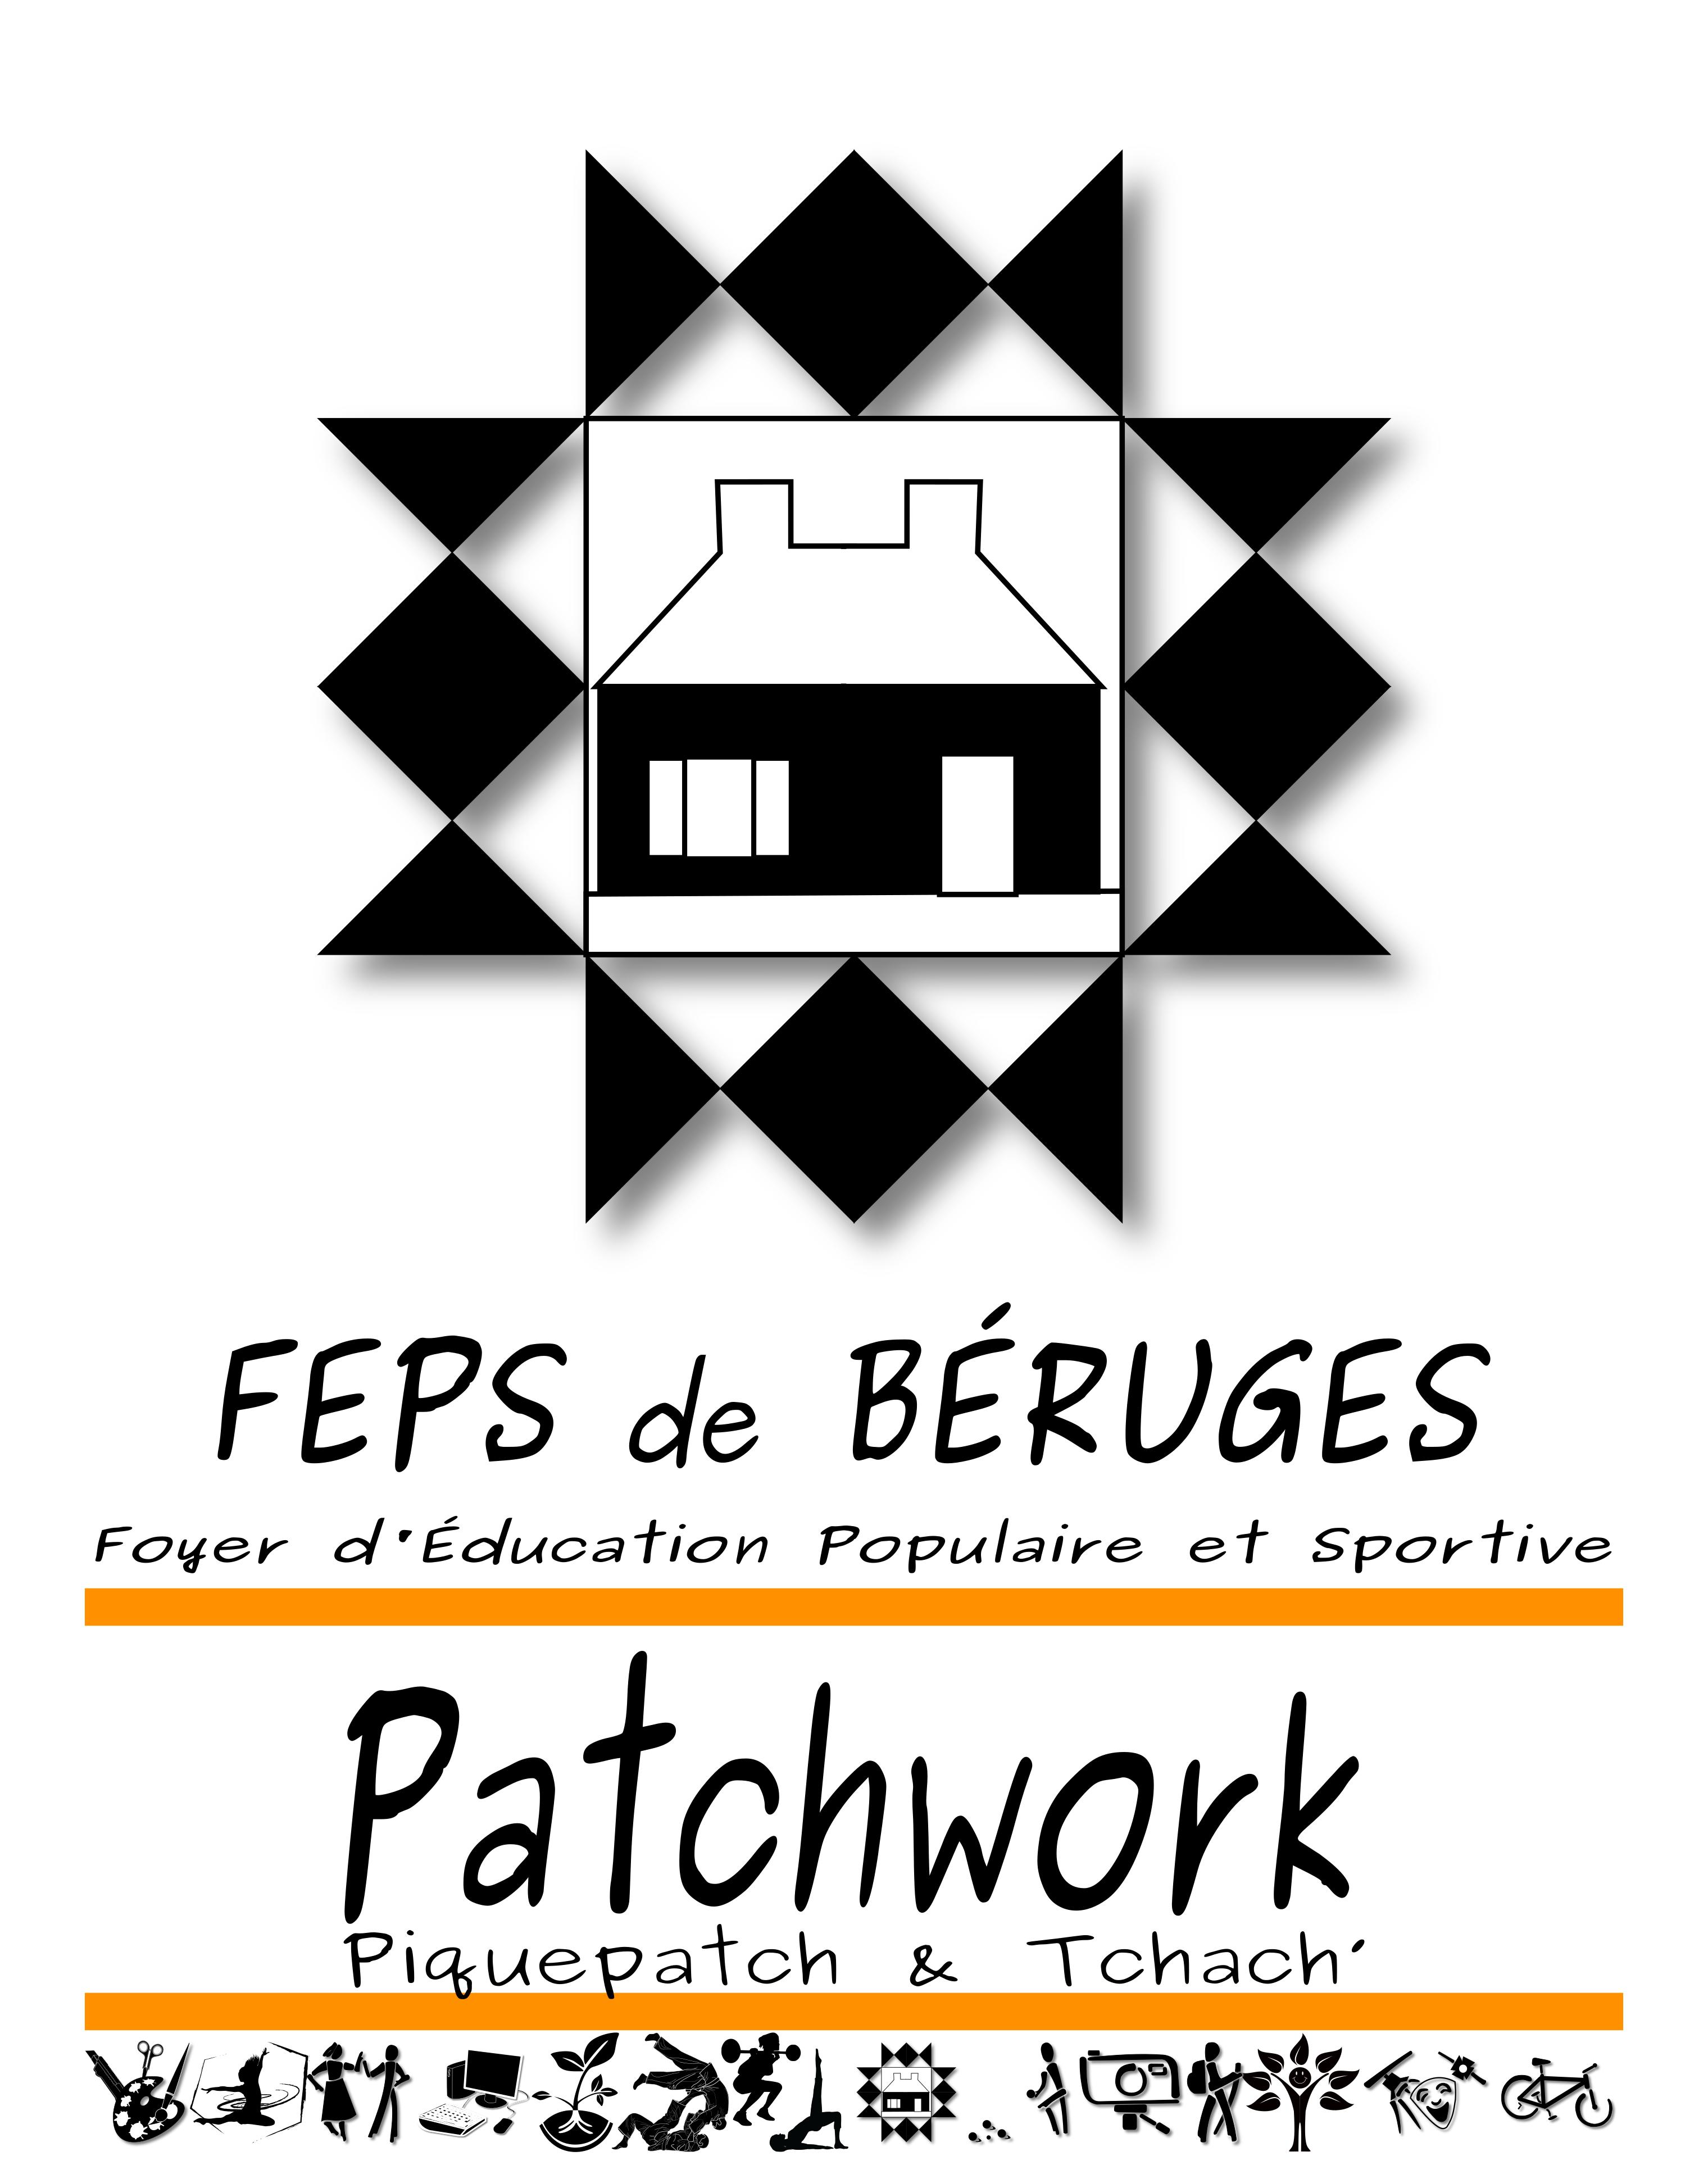 FEPS Patchwork